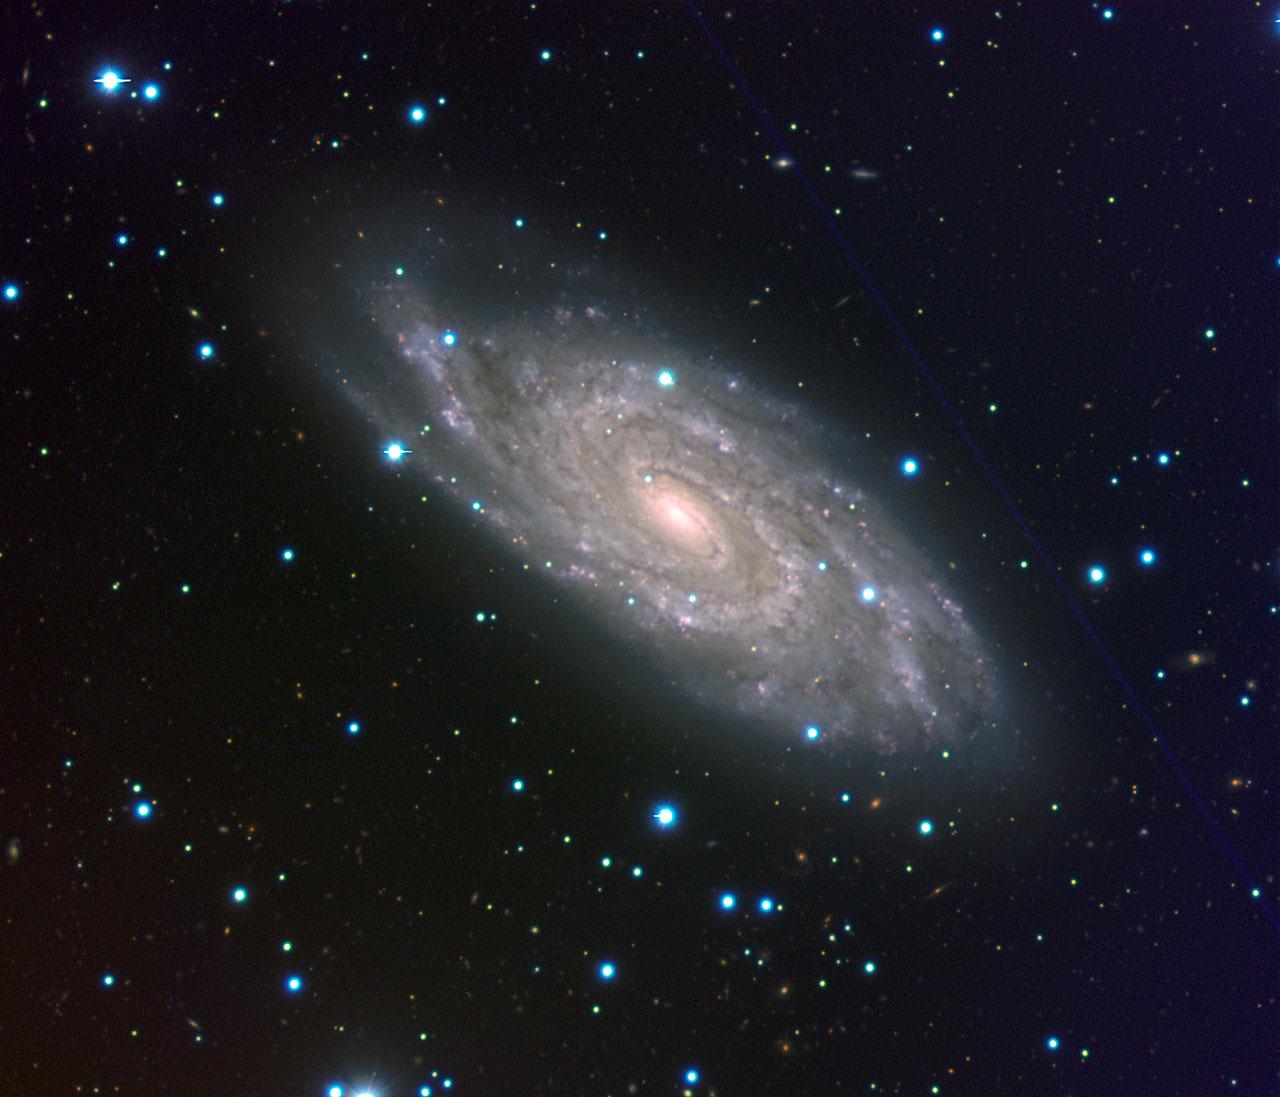 Spiral galaxy NGC 6118